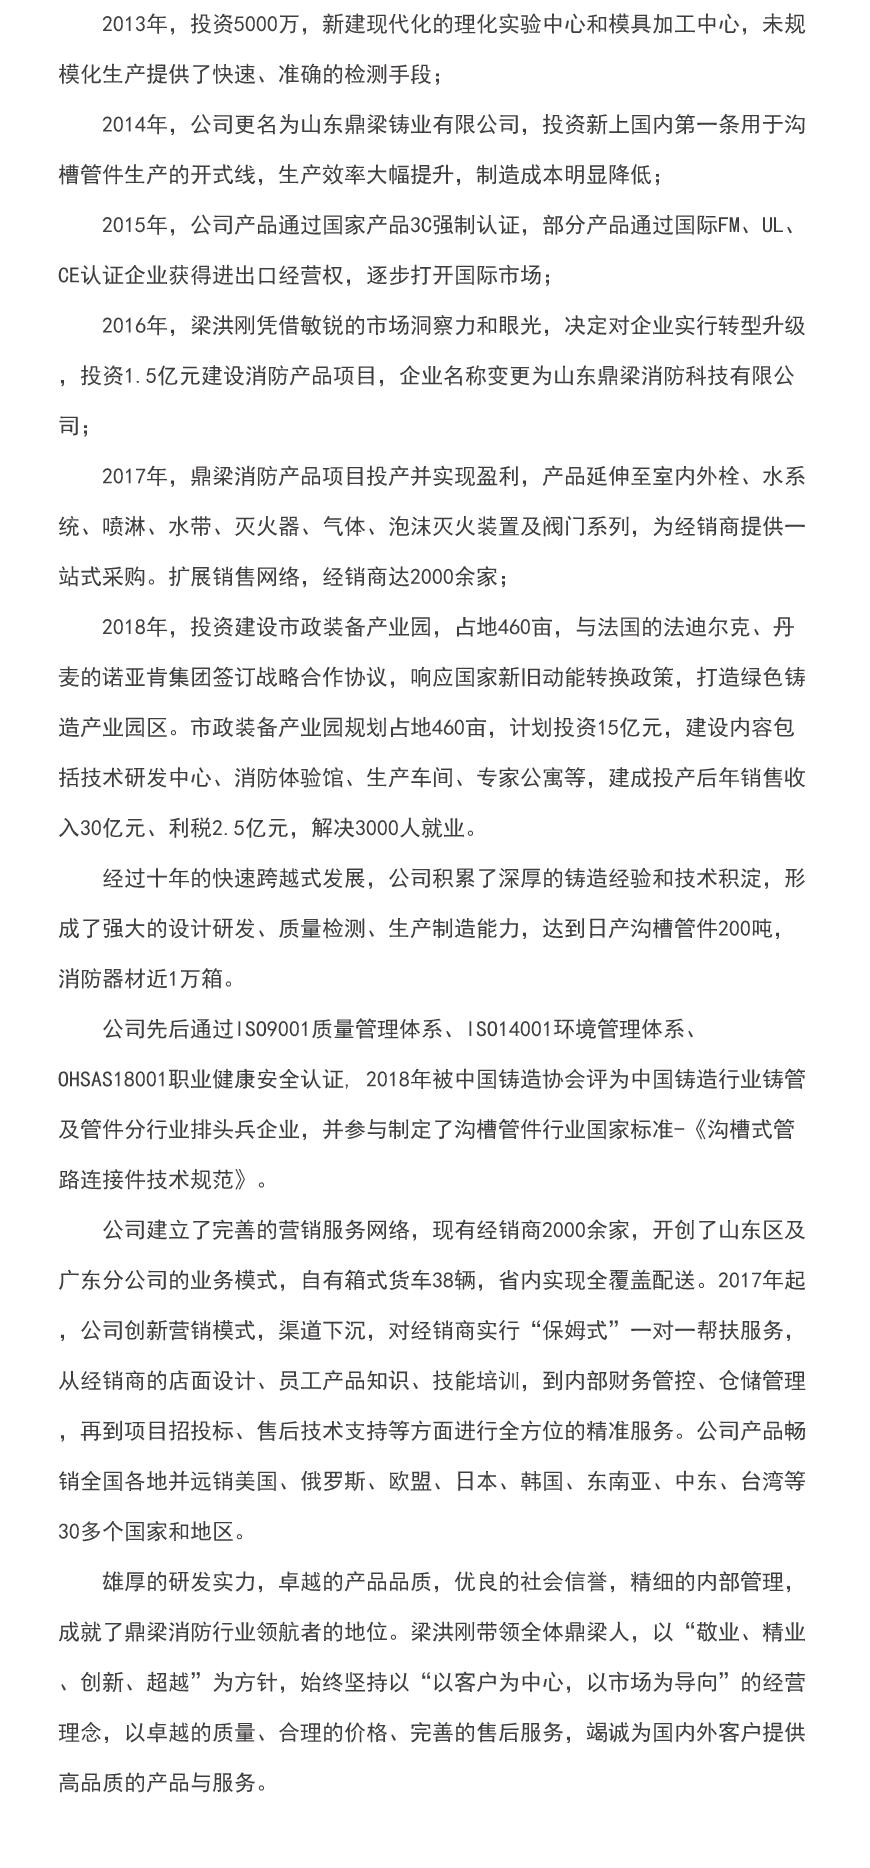 董事长介绍1_02.png